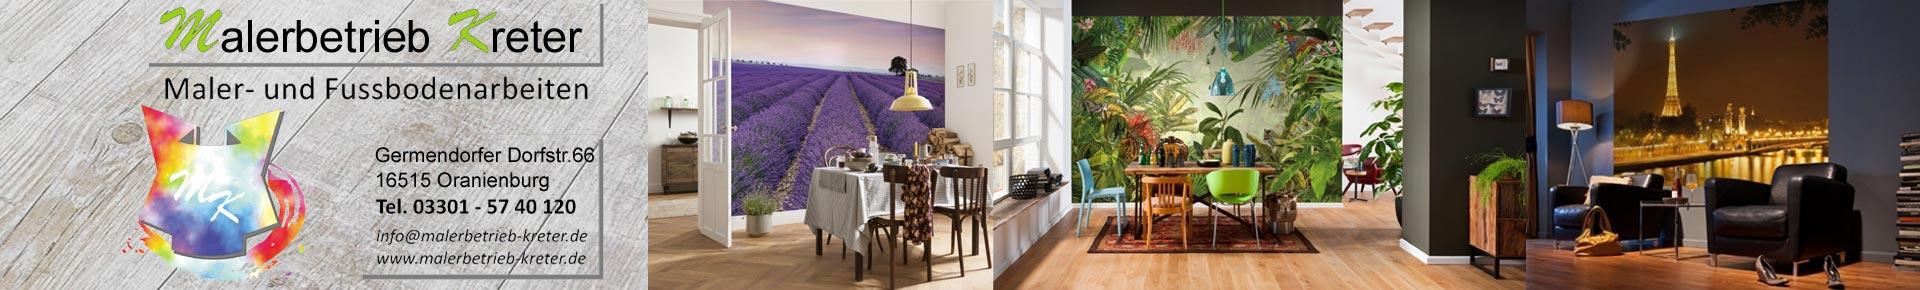 malerbetrieb kreter willkommen. Black Bedroom Furniture Sets. Home Design Ideas